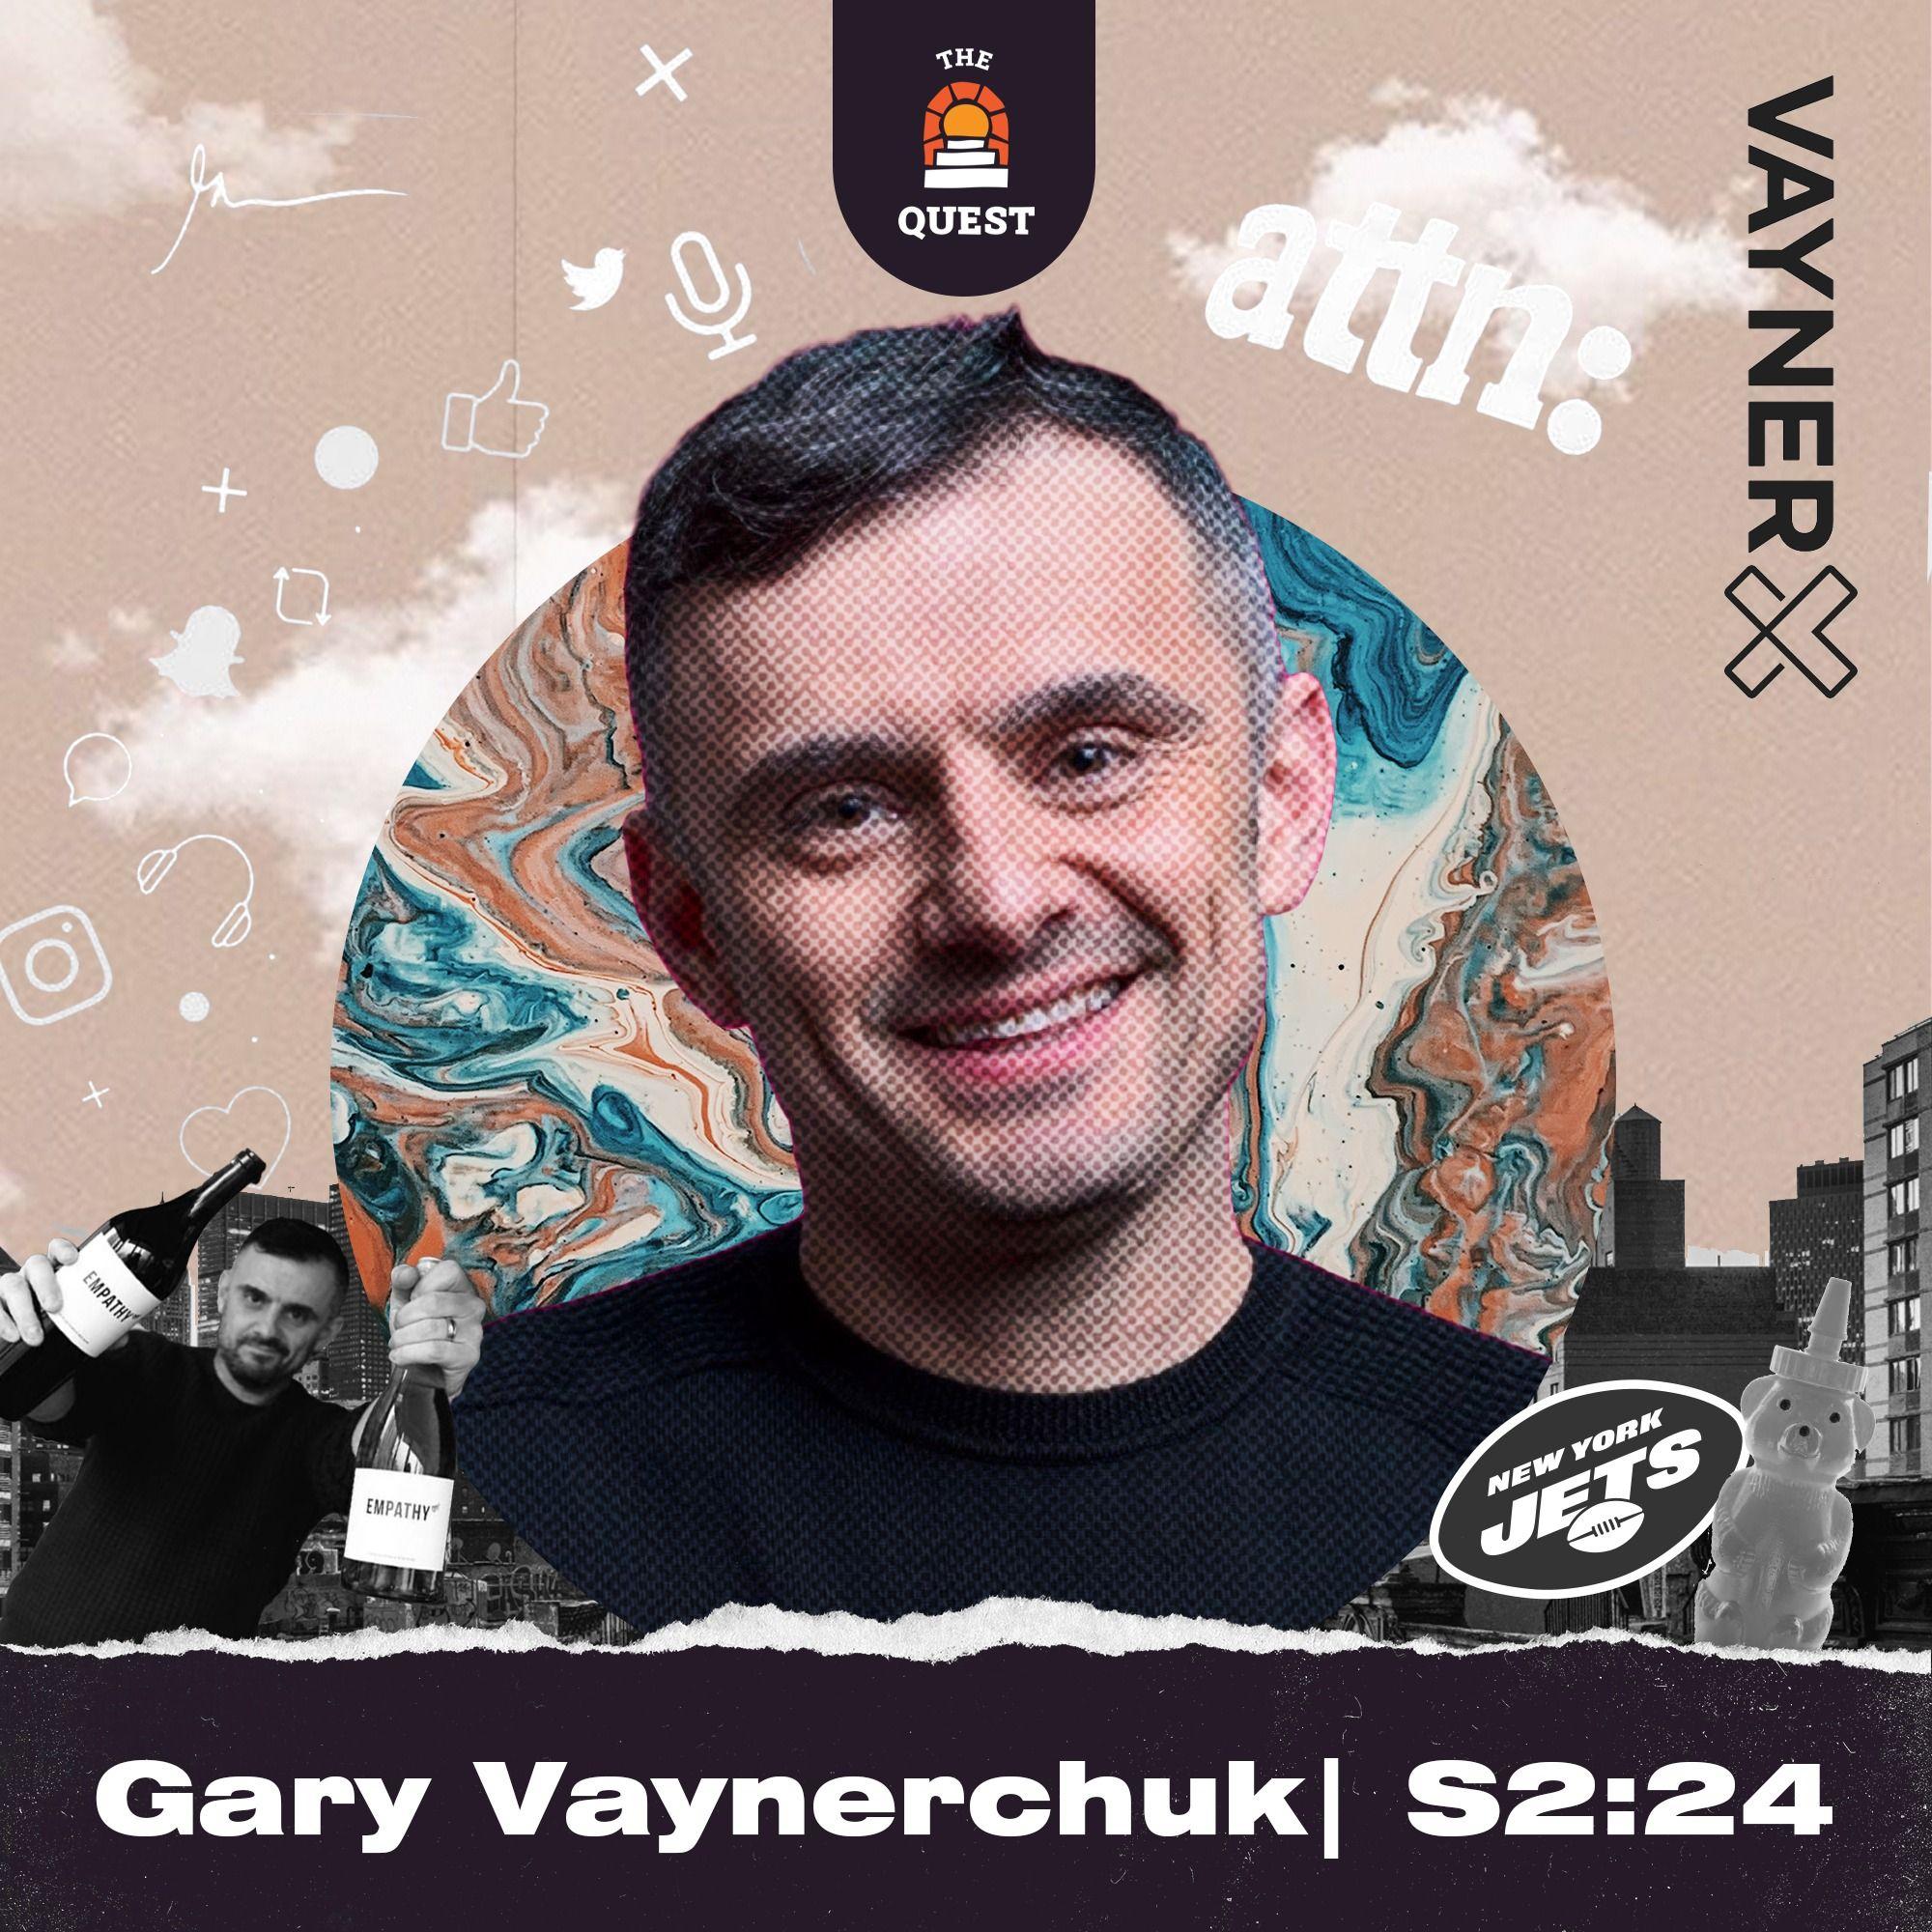 Gary Vaynerchuk - The GaryVee Story   YouTuber, Social Media, CEO, Entrepreneur, Mentor